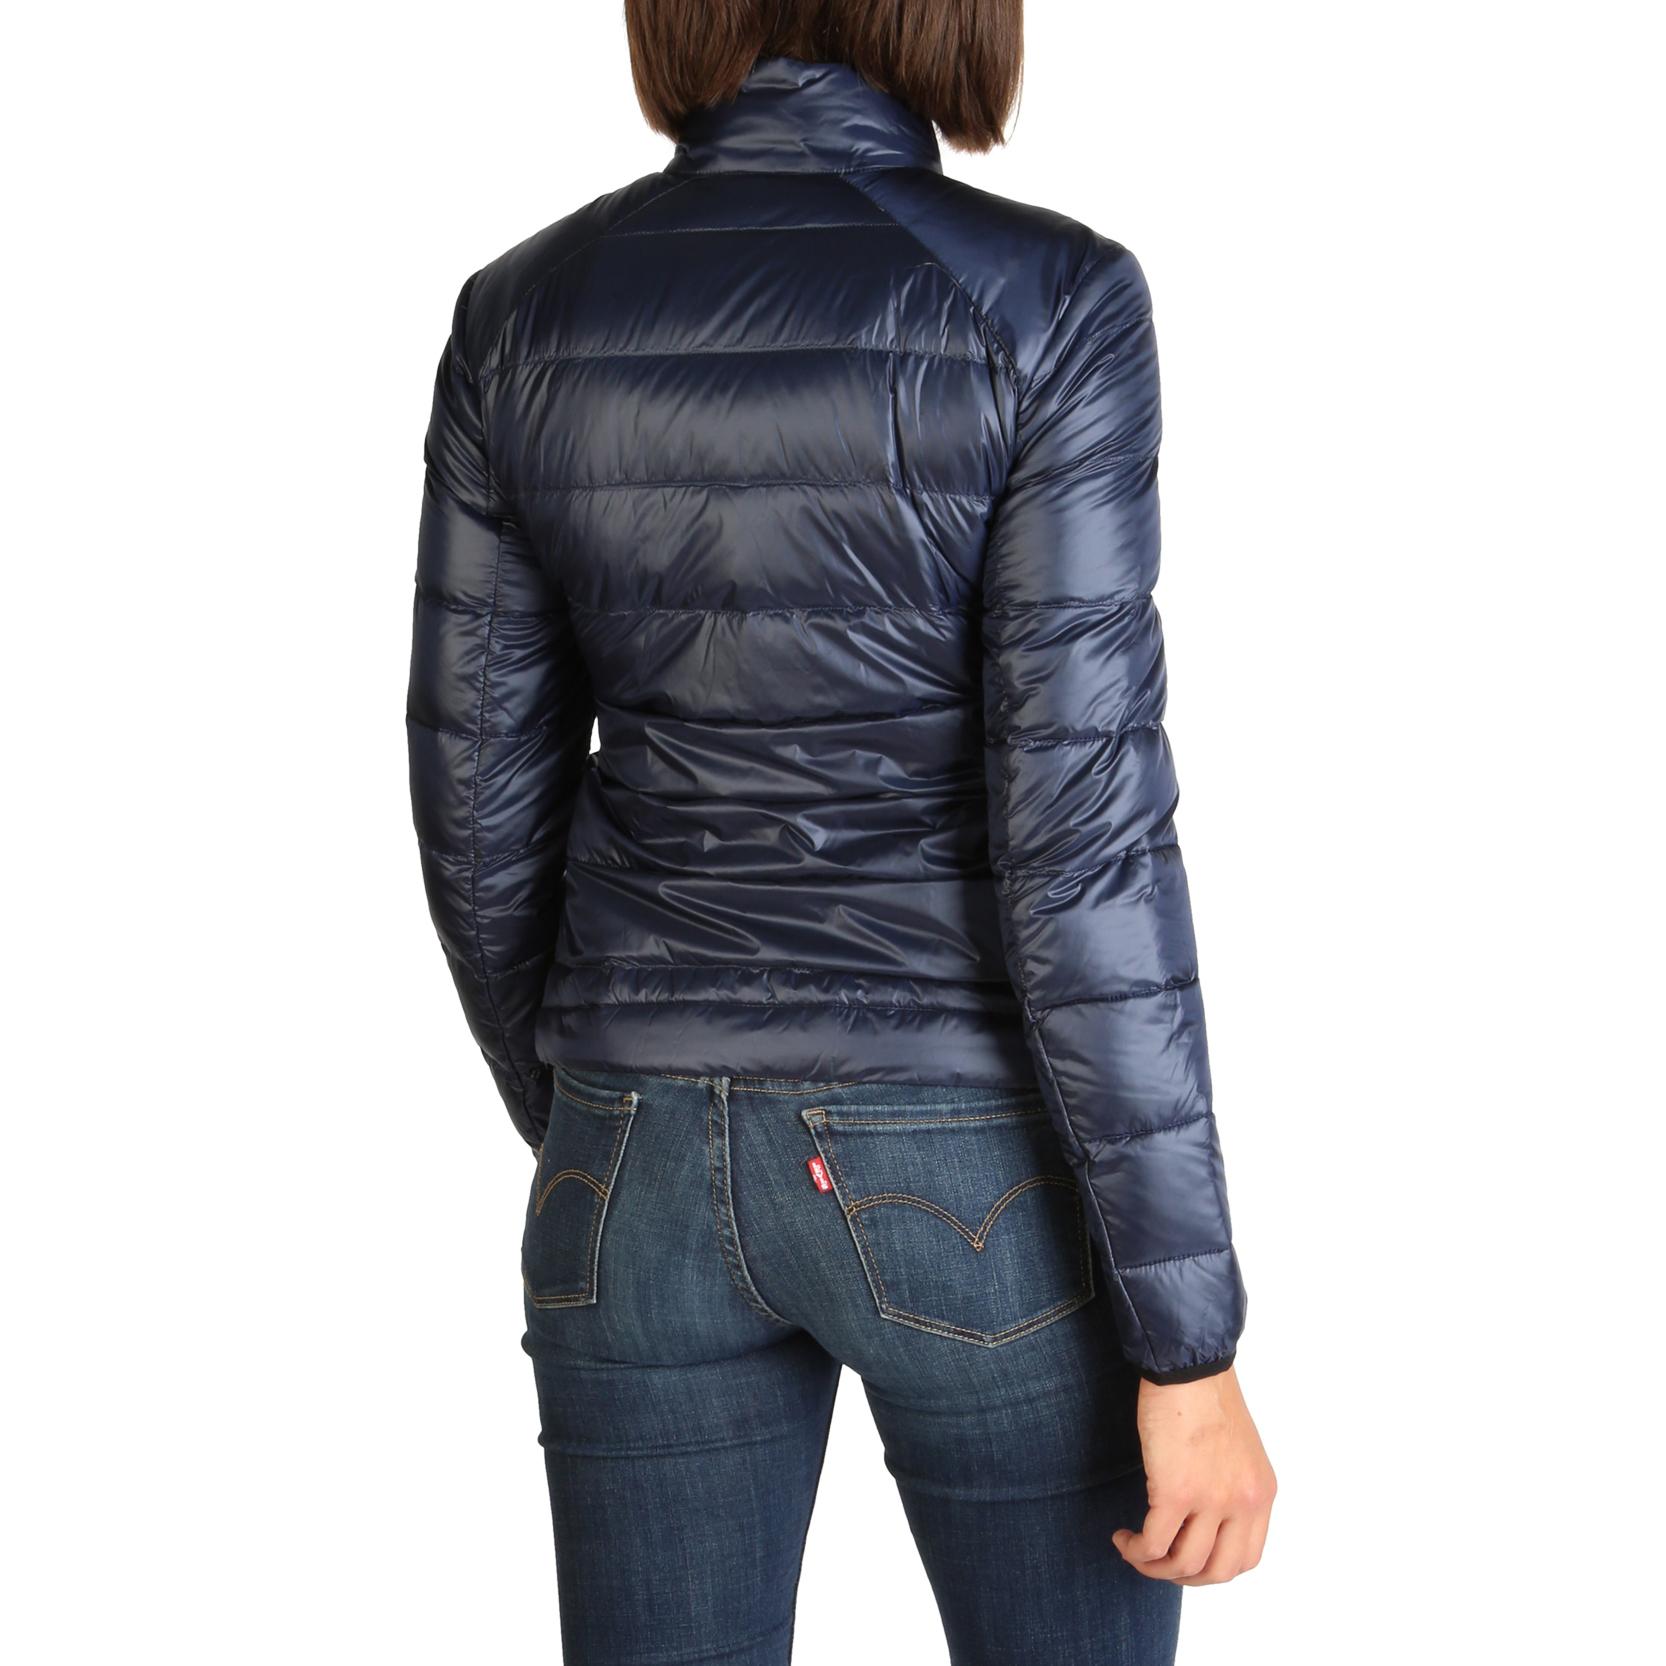 101949-890194-Blauer-3066-Women-Blue-101949-Blauer thumbnail 2